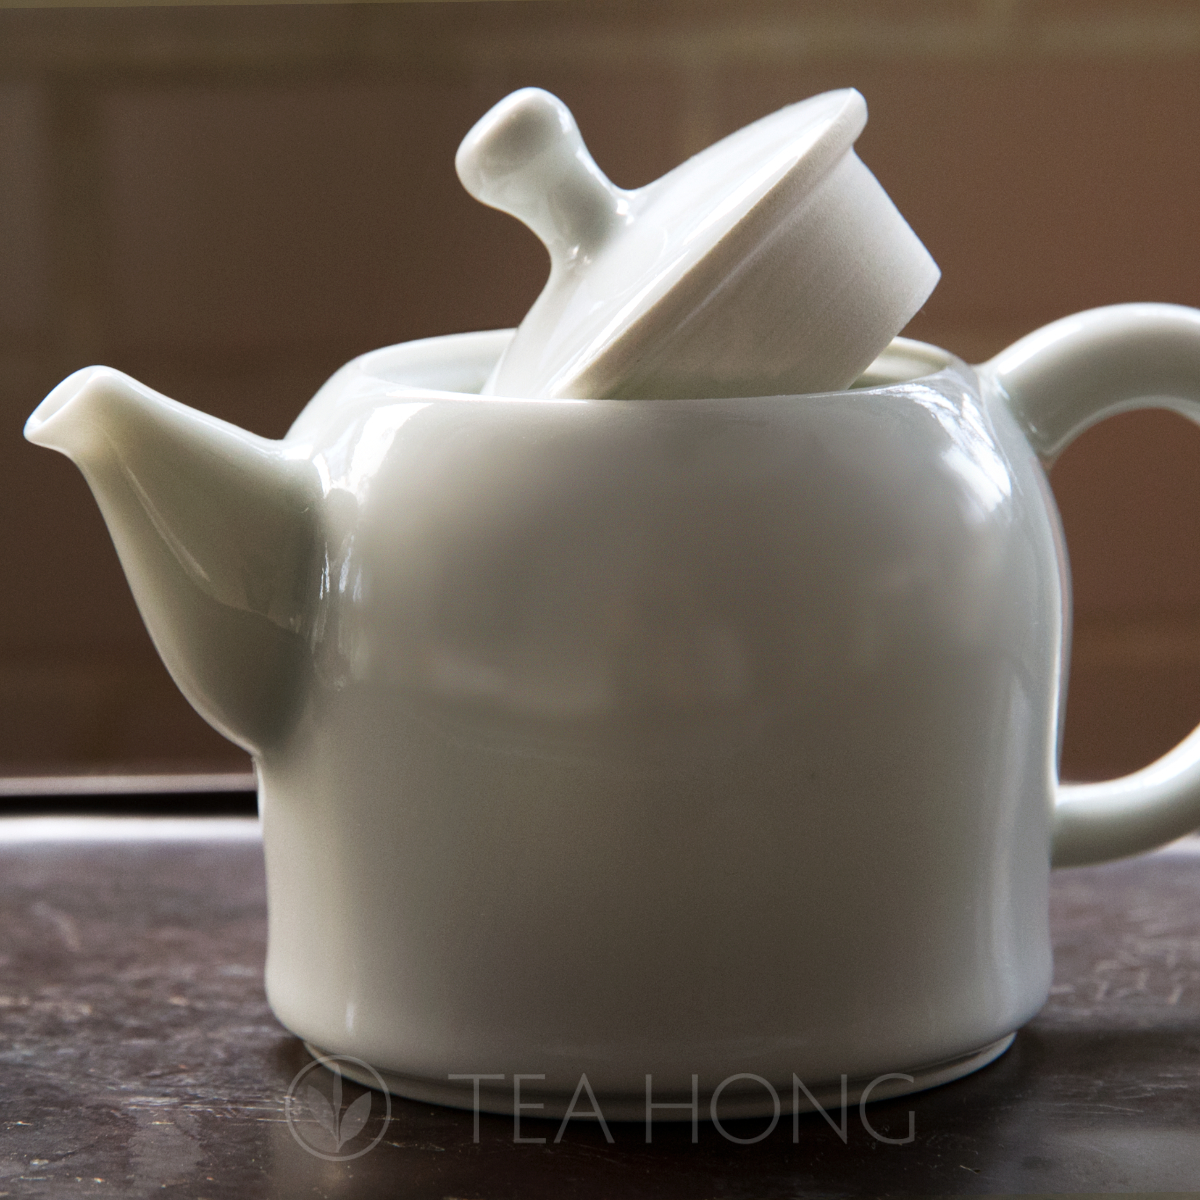 A porcelain teapot